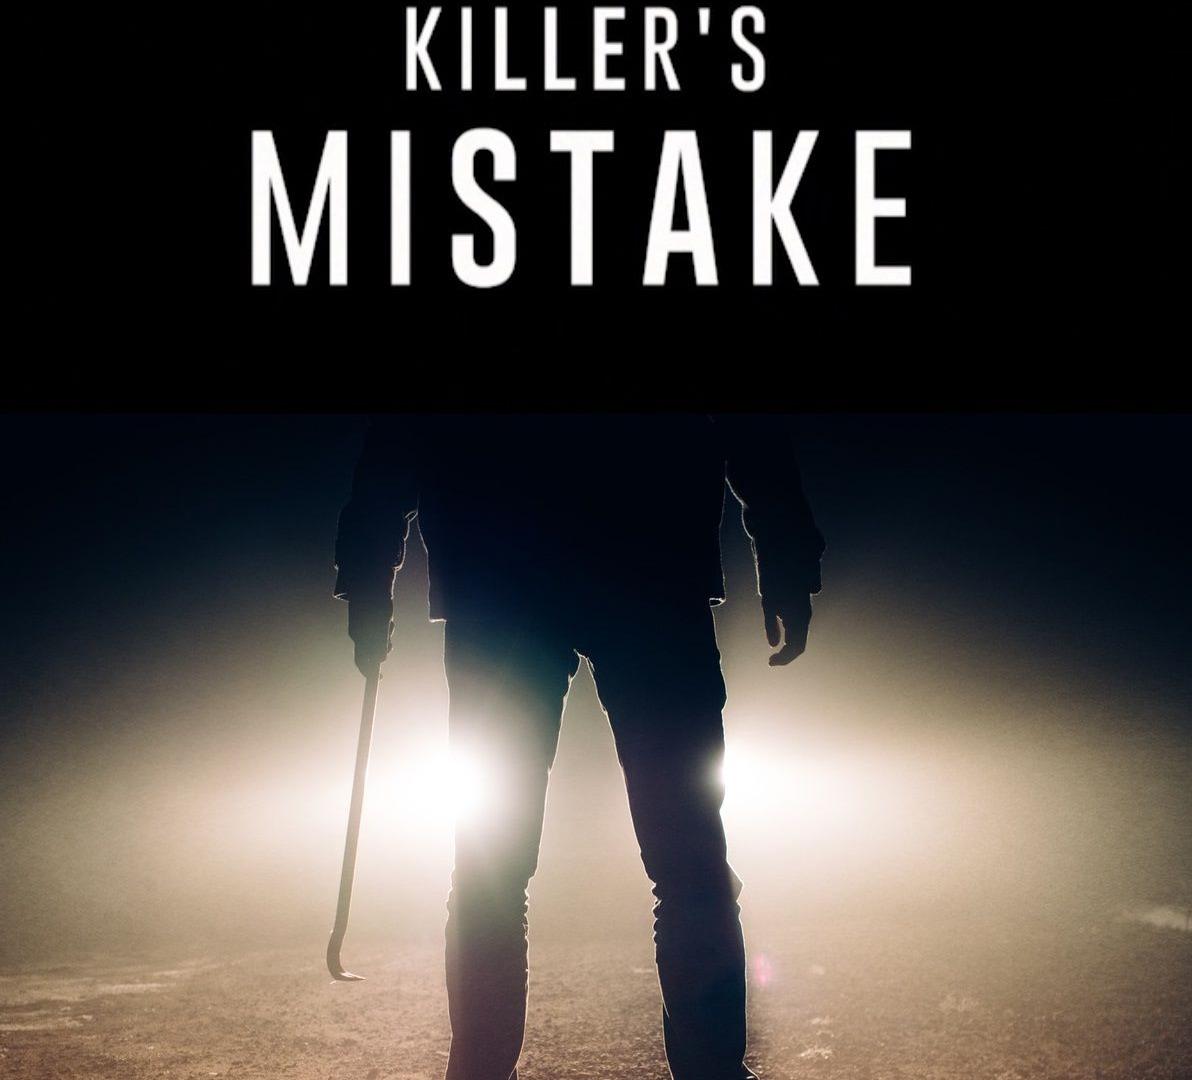 Show A Killer's Mistake